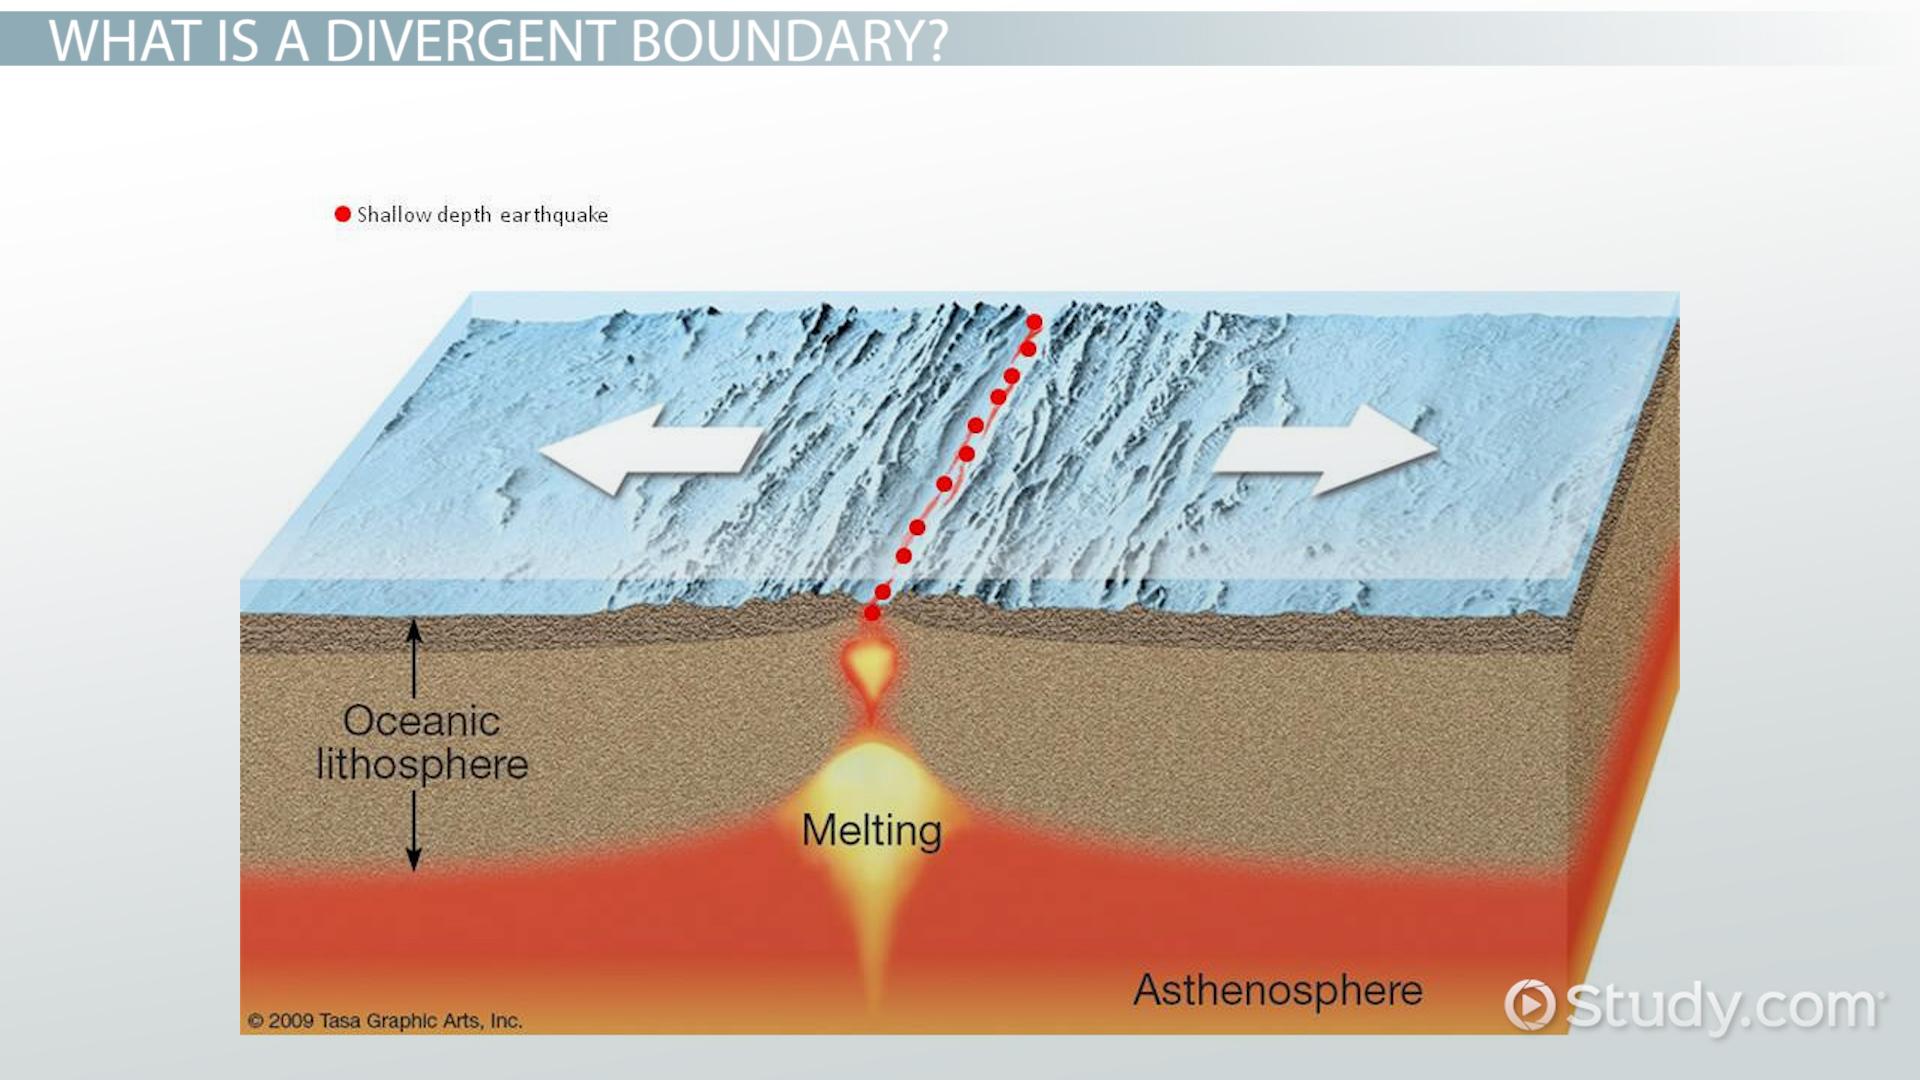 convergent boundary diagram 1997 dodge dakota headlight wiring list of synonyms and antonyms the word divergent